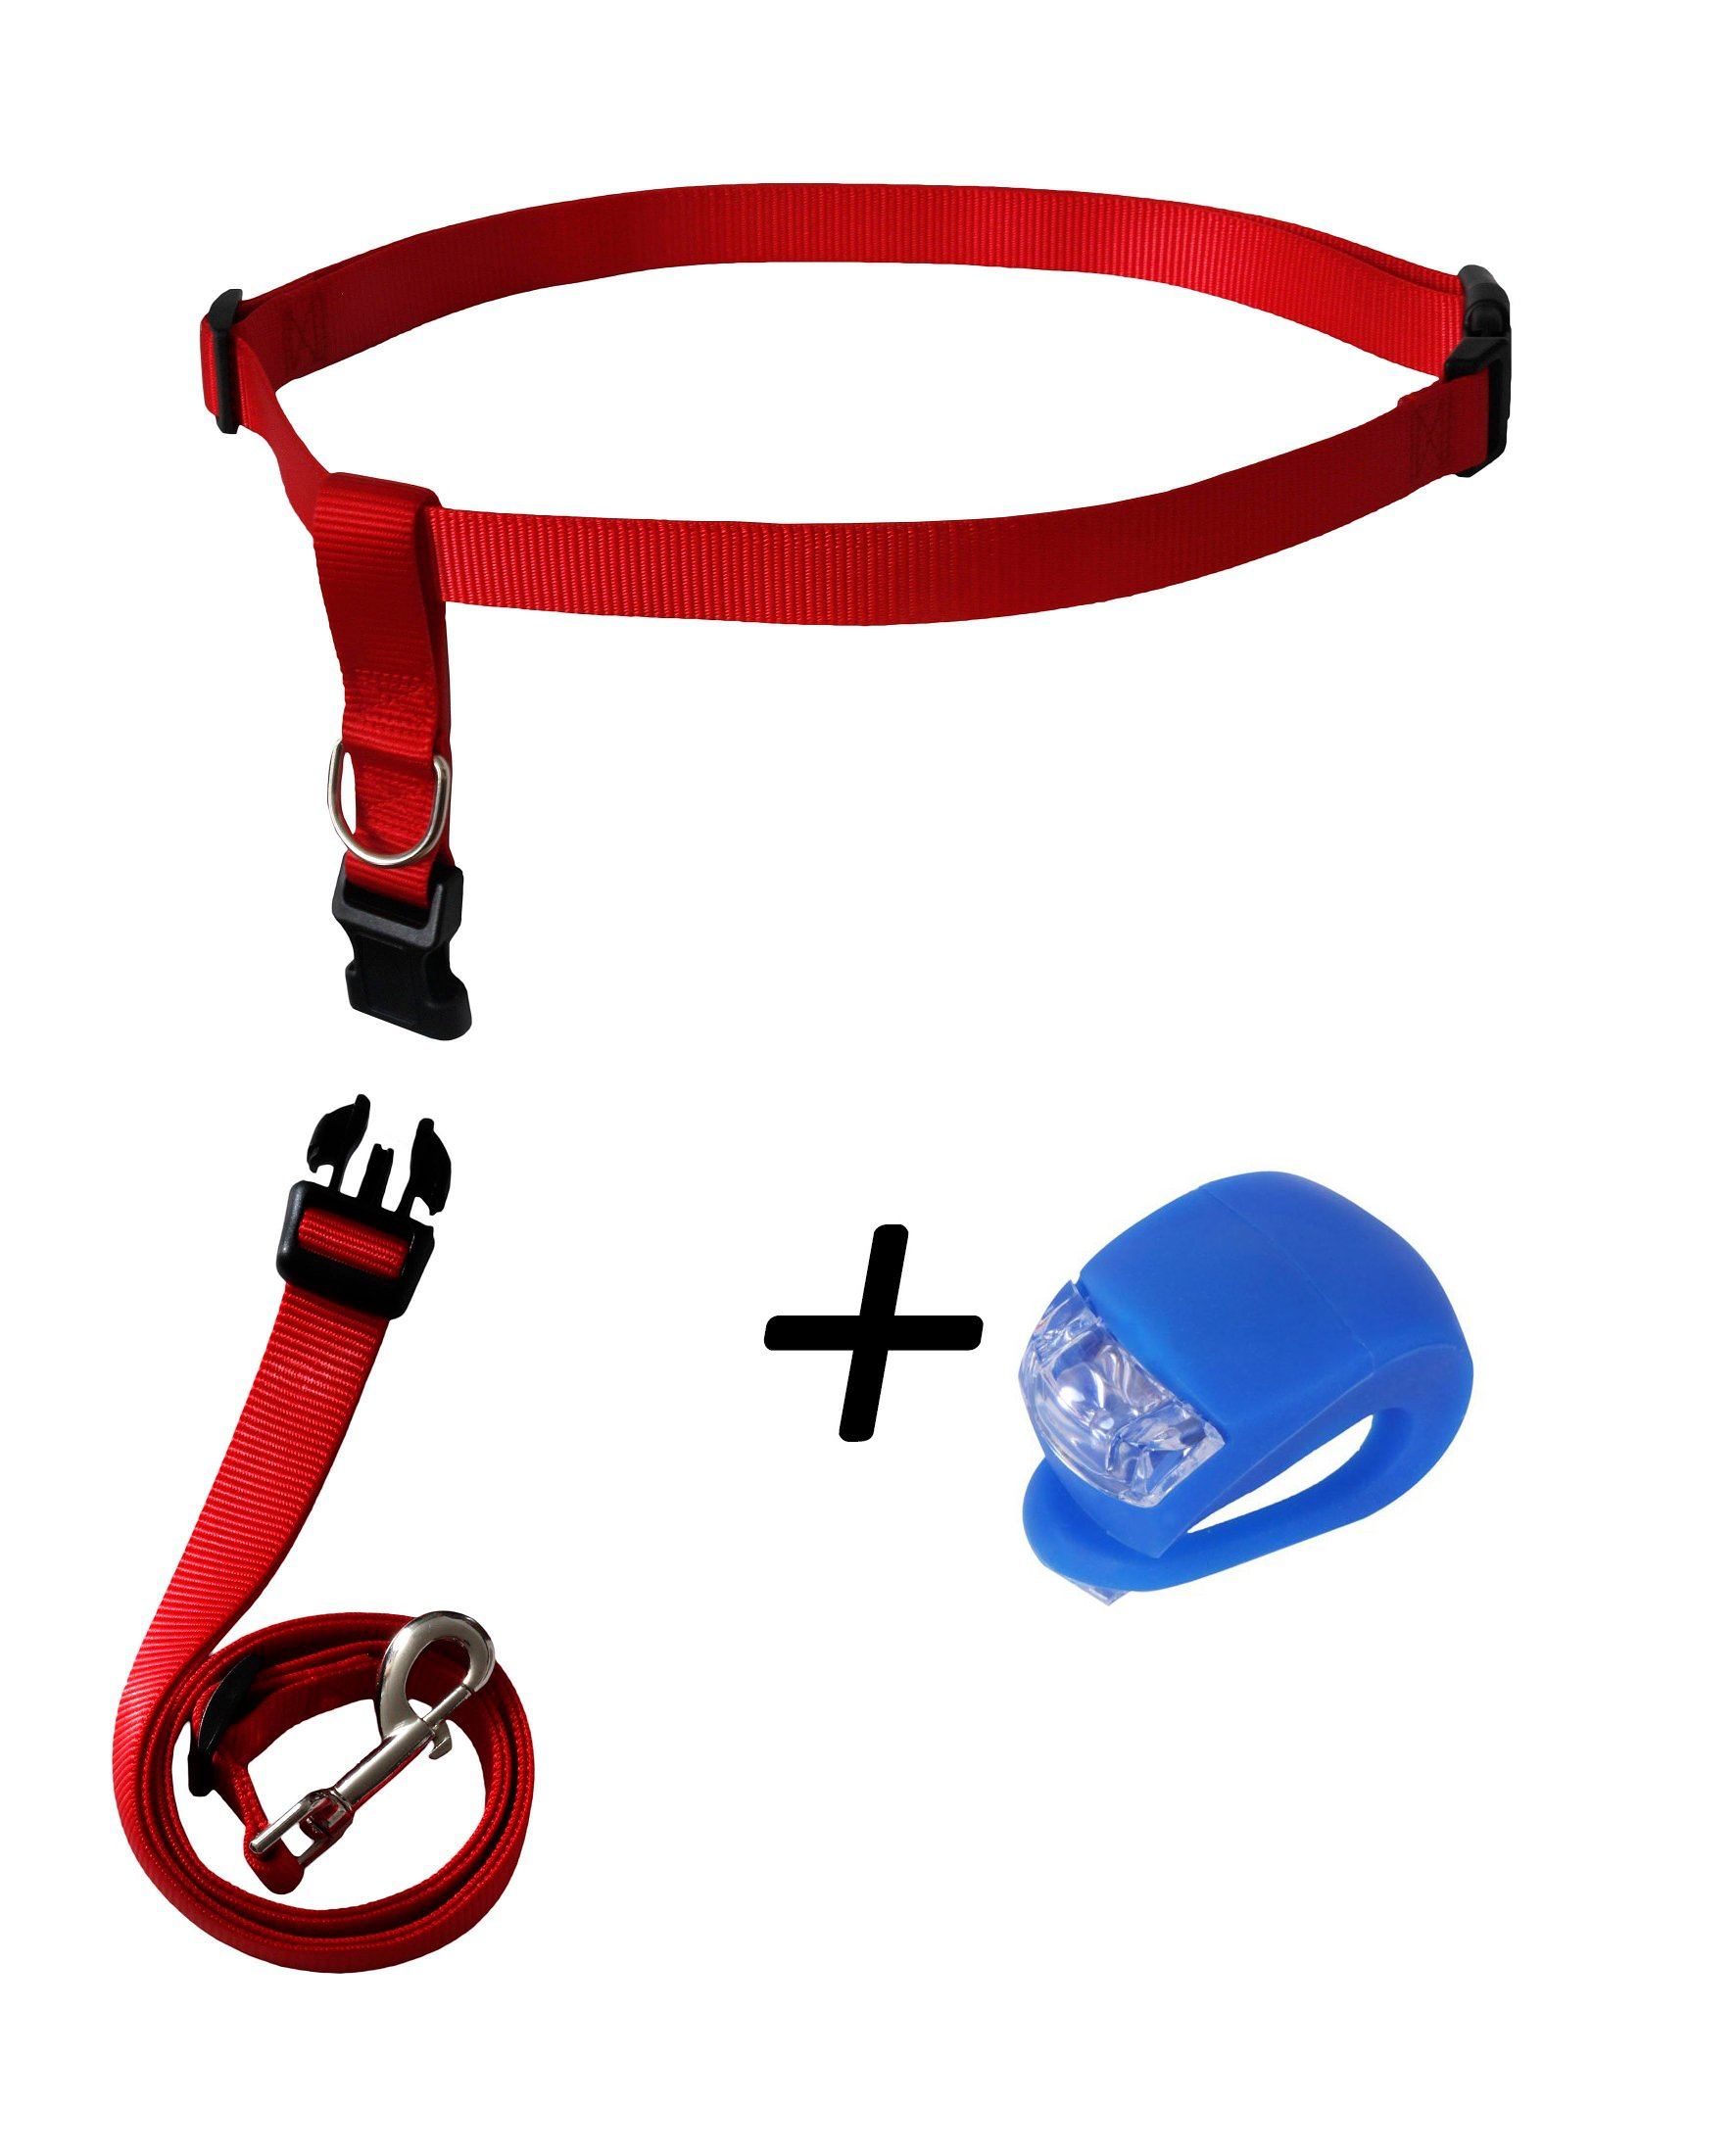 RoadRunner Running Dog Leash Hands Free Including LED Light. Great for Walking, Running, Biking and Jogging (Red).